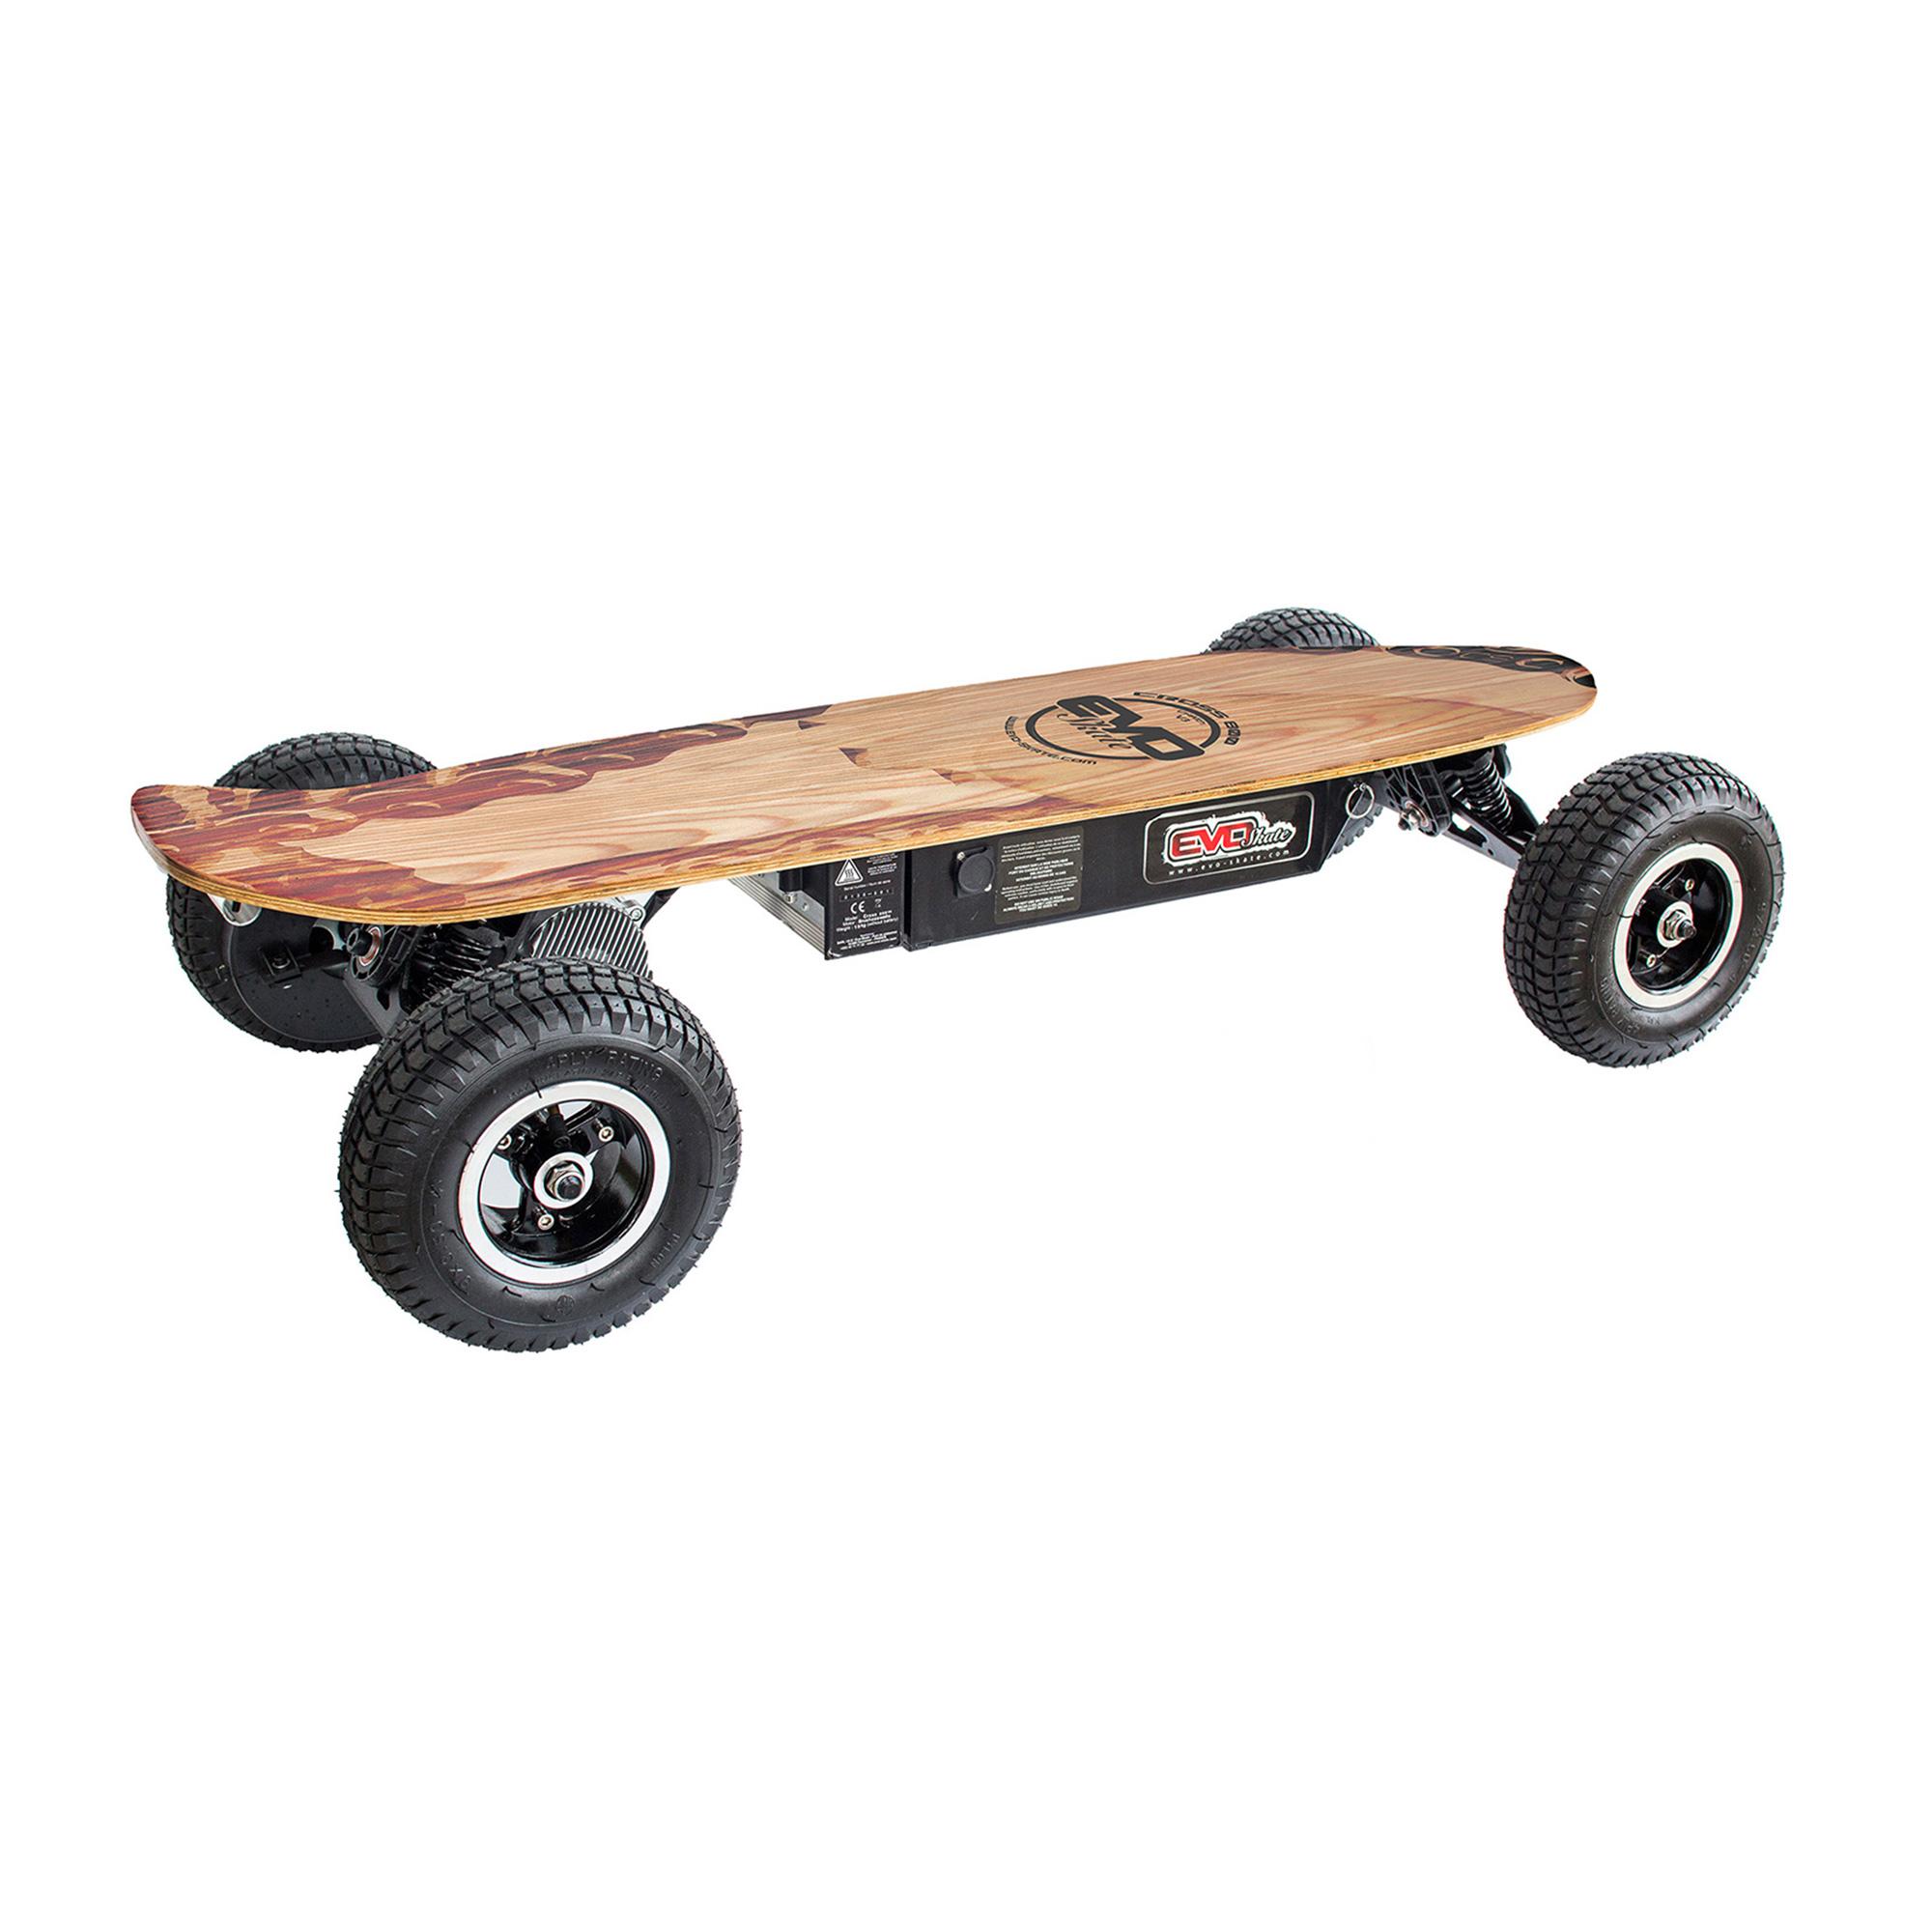 skate lectrique tout terrain cross800 chain v3. Black Bedroom Furniture Sets. Home Design Ideas